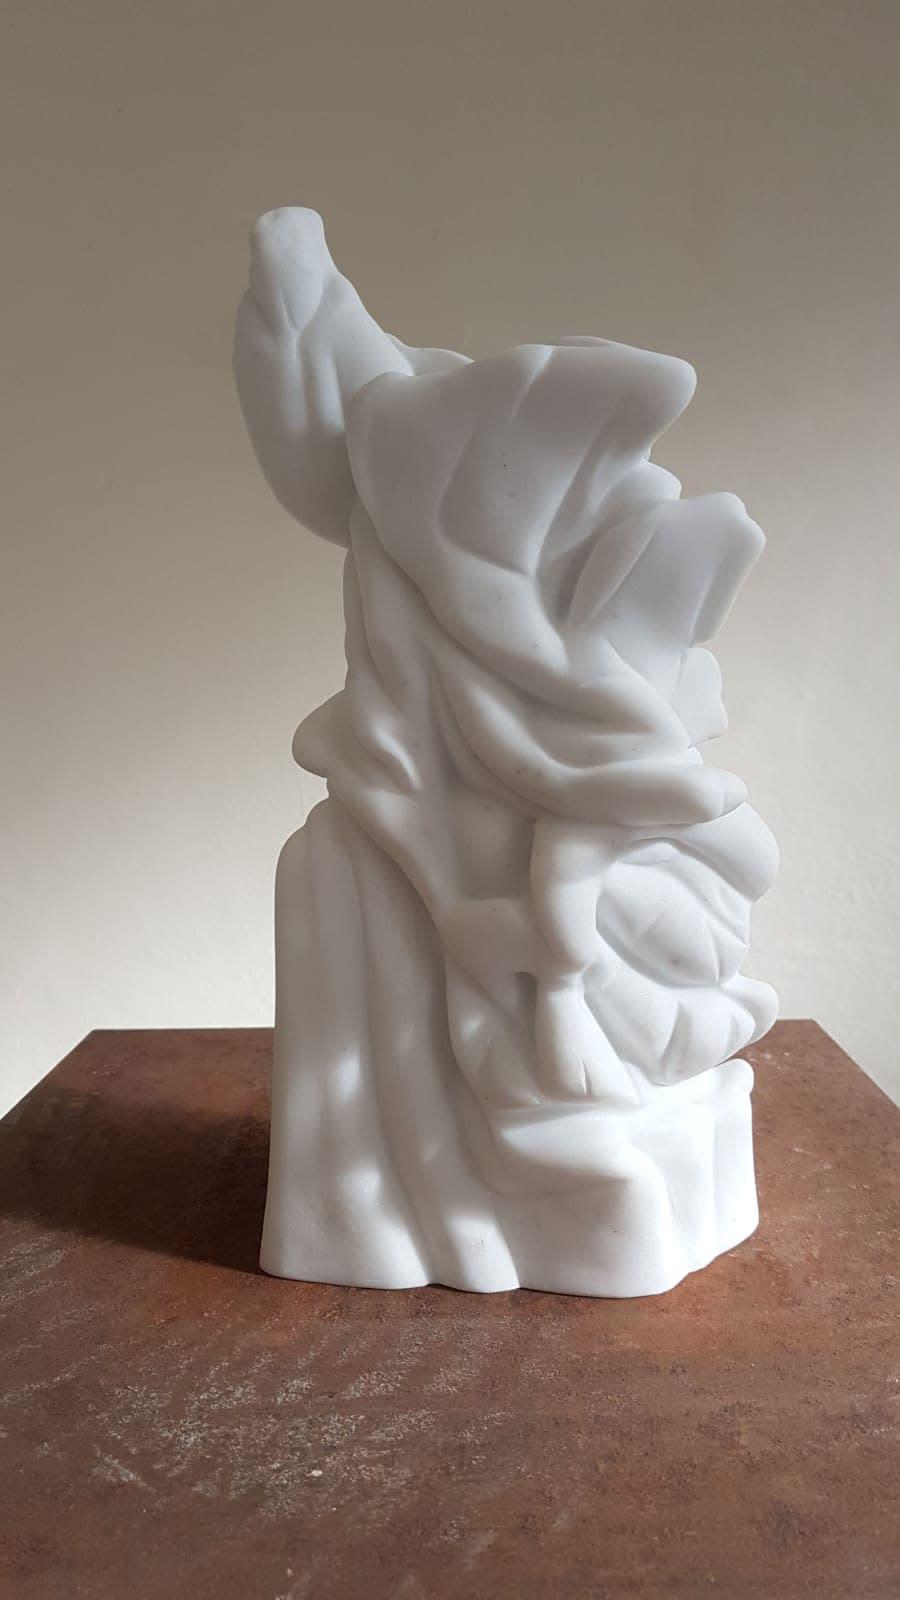 Richard Stone, sentinel, 2019 Statuario marble 30 x 18 x 15 cm